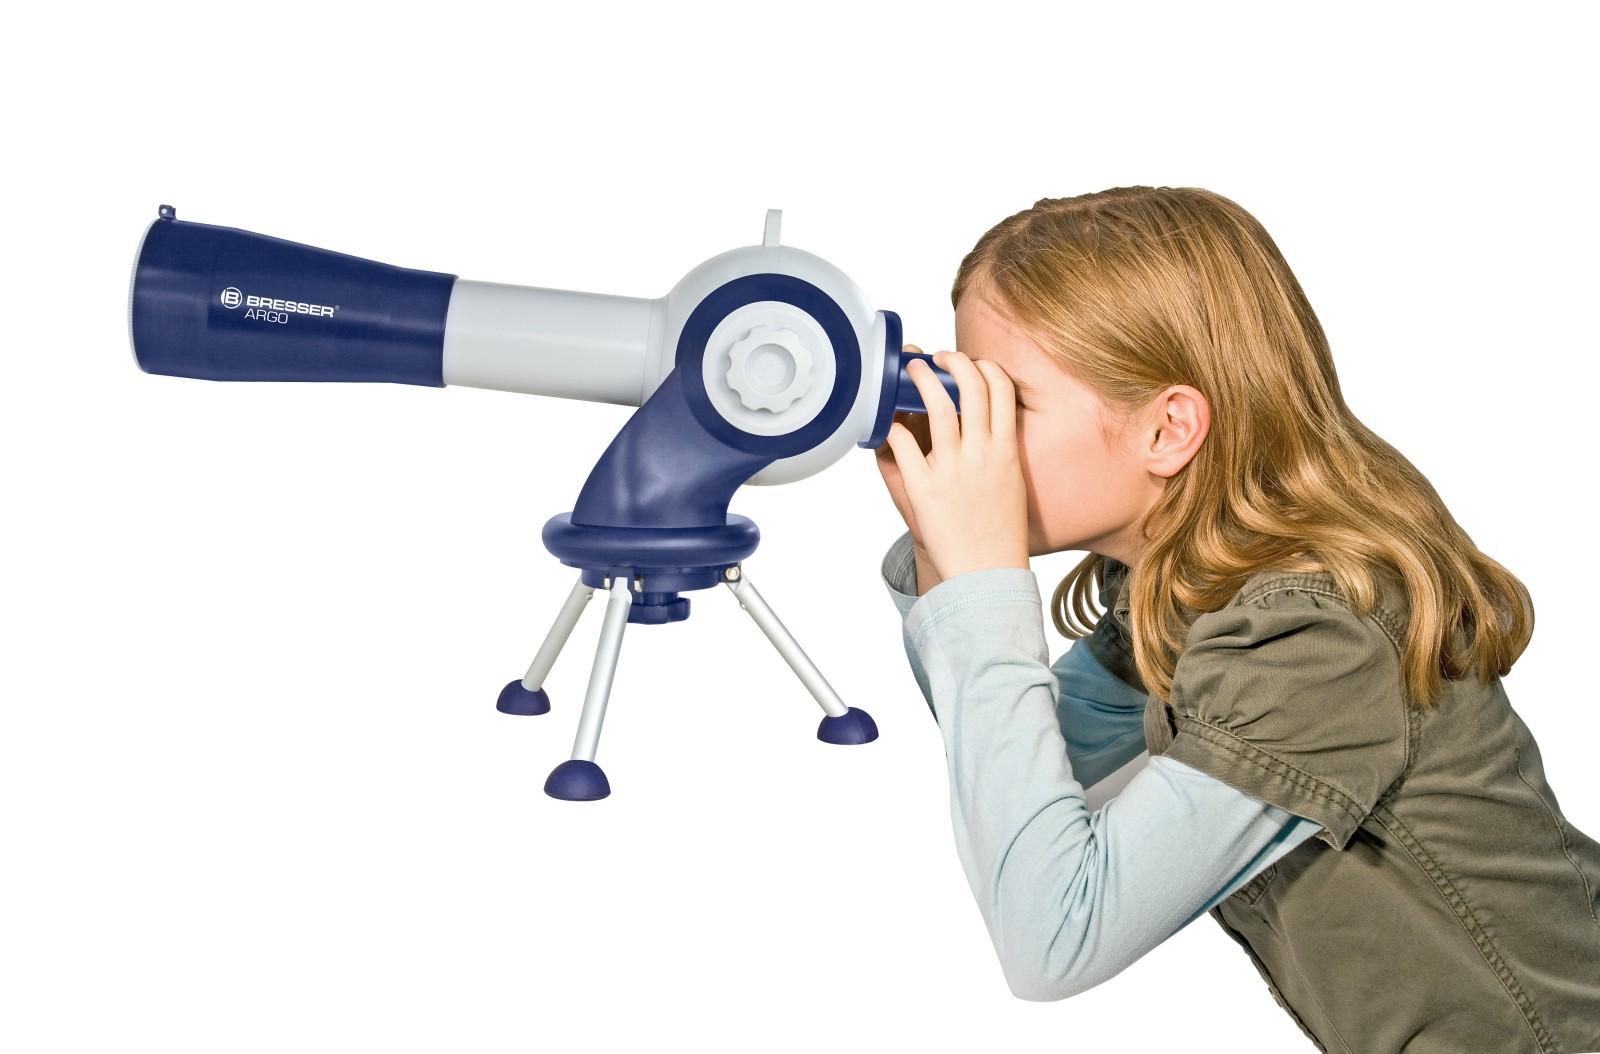 Bresser junior telemikroskop argo bresser